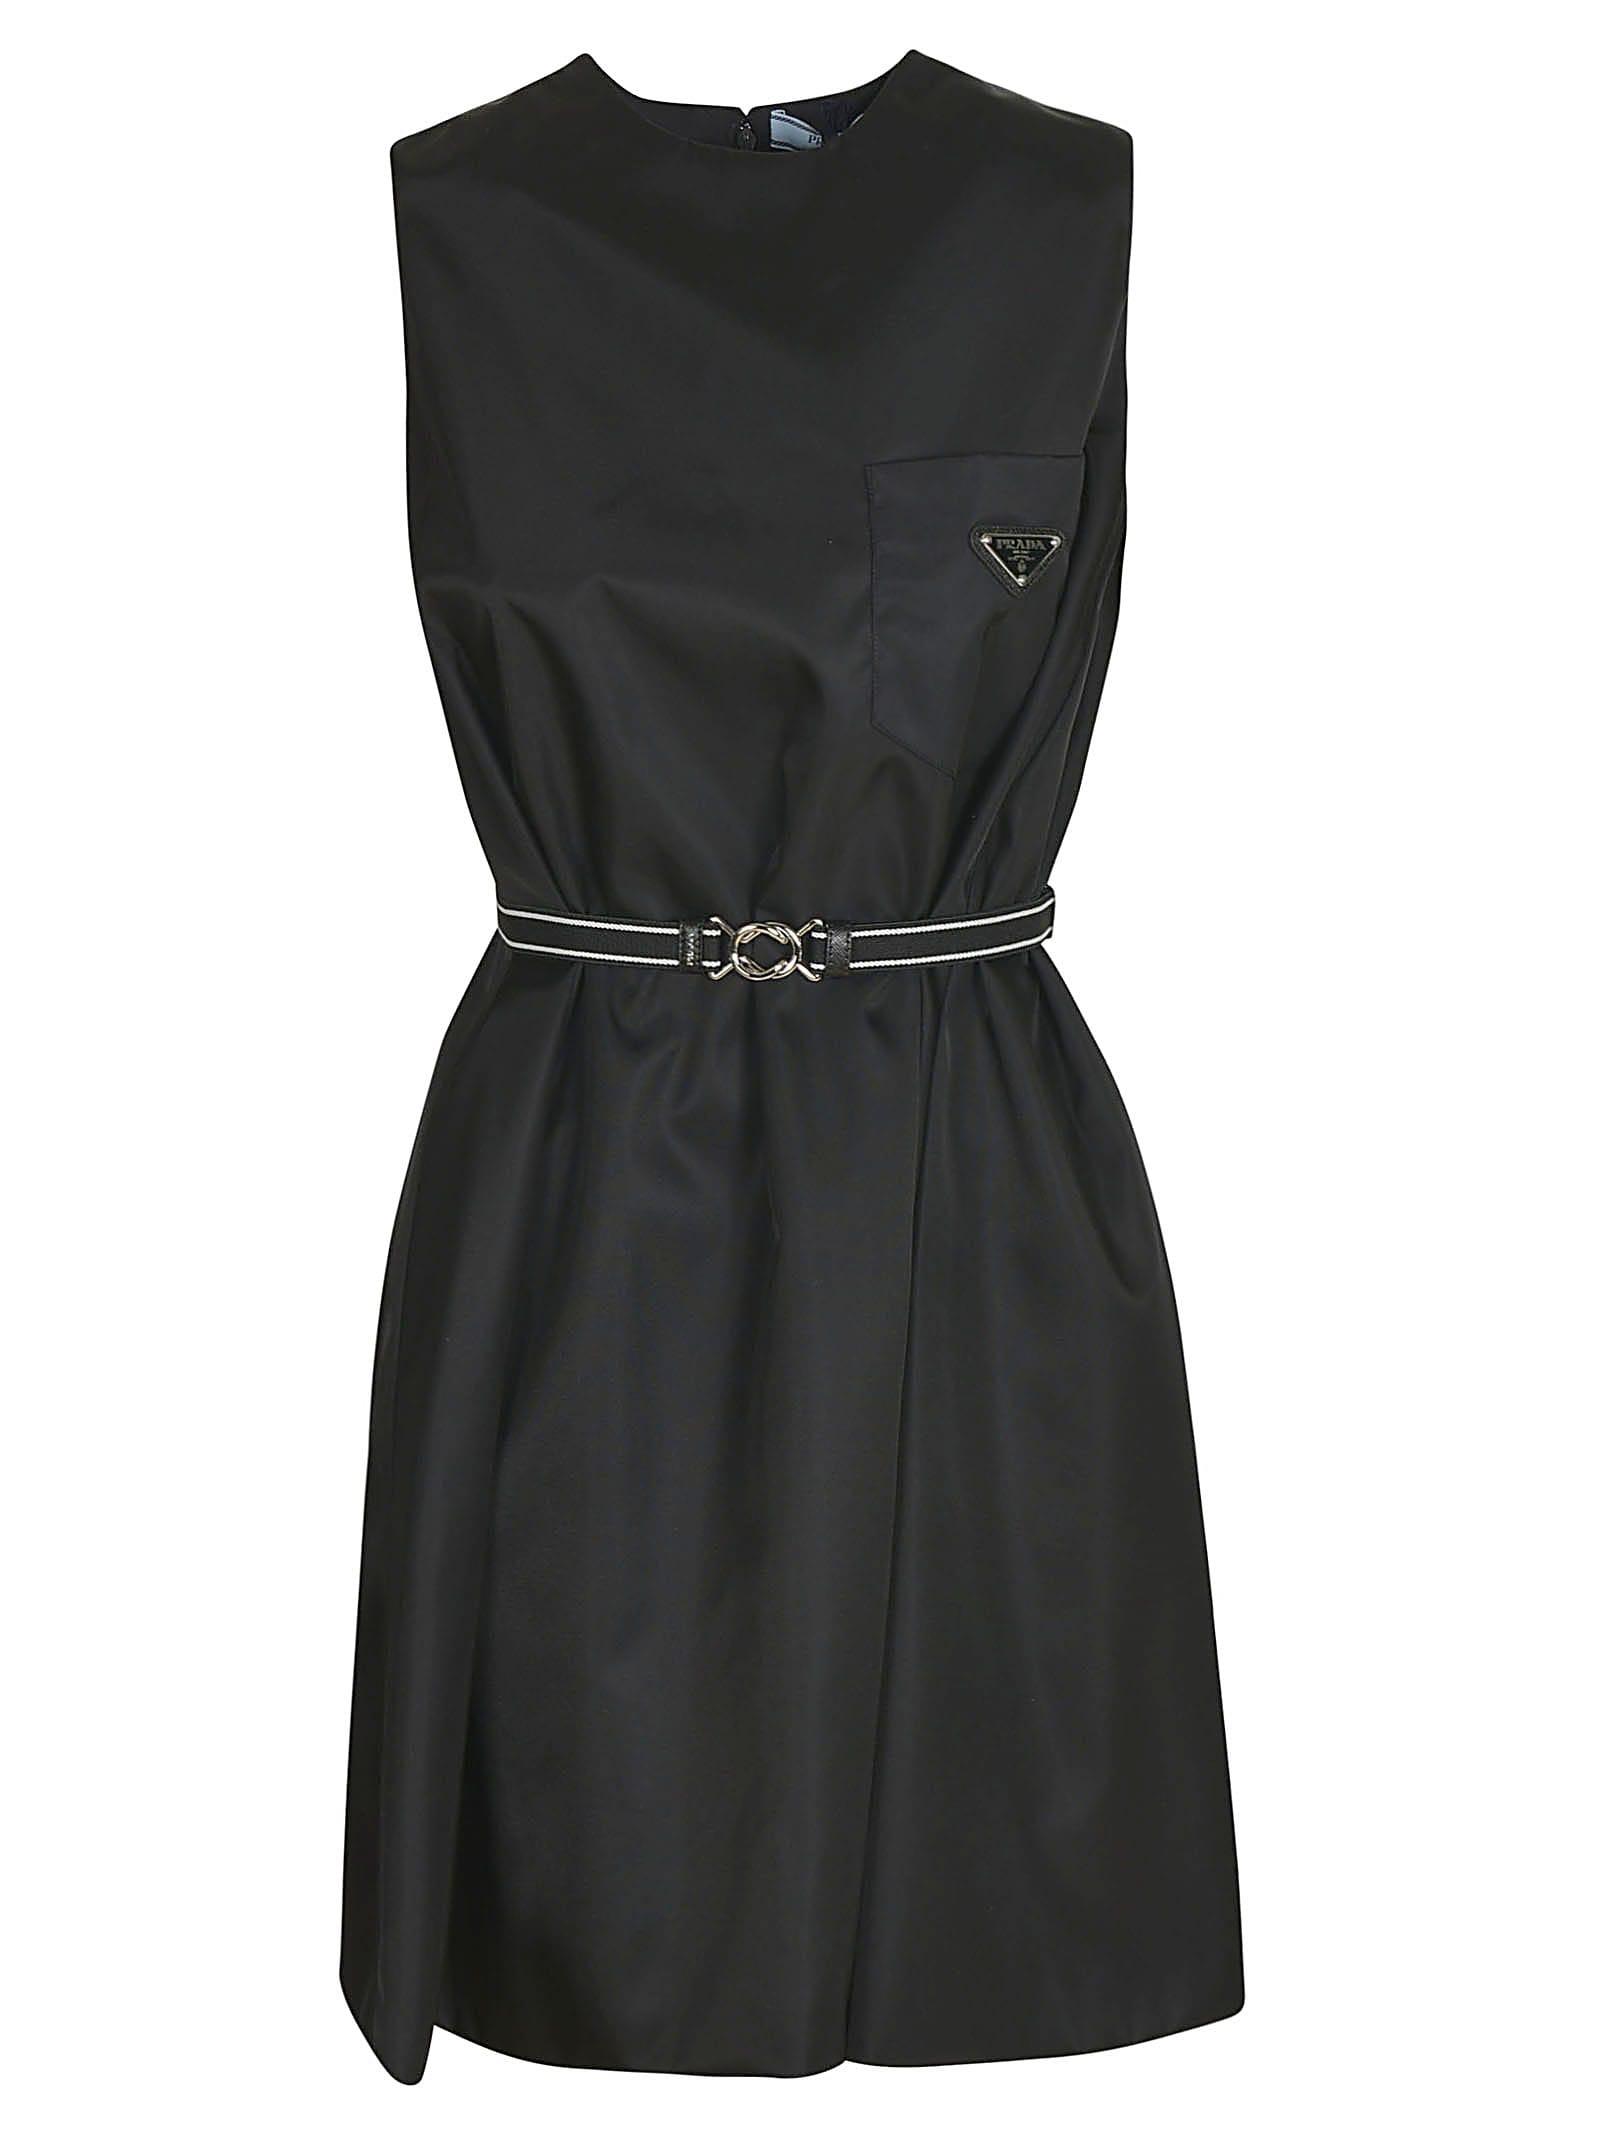 Prada Sleeveless Belted Dress